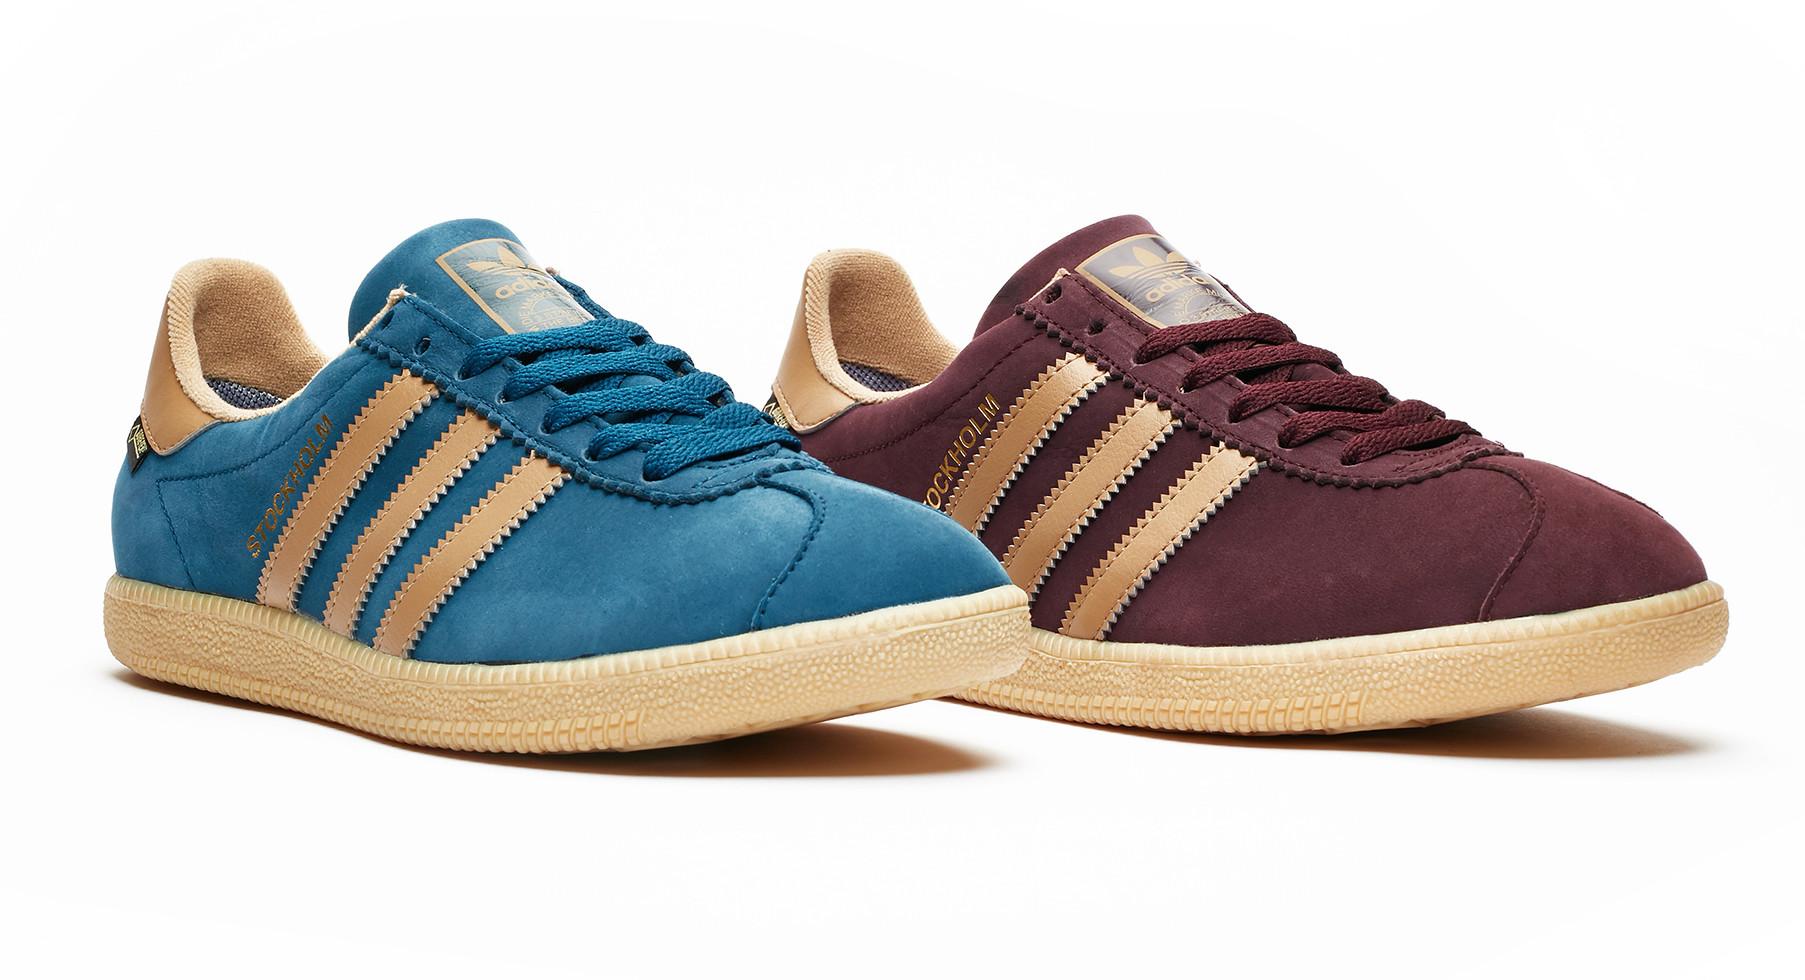 4d191c3a423549 Sneakersnstuff x Adidas Originals Stockholm Gore-Tex AC7752 AC7753 Release  Date